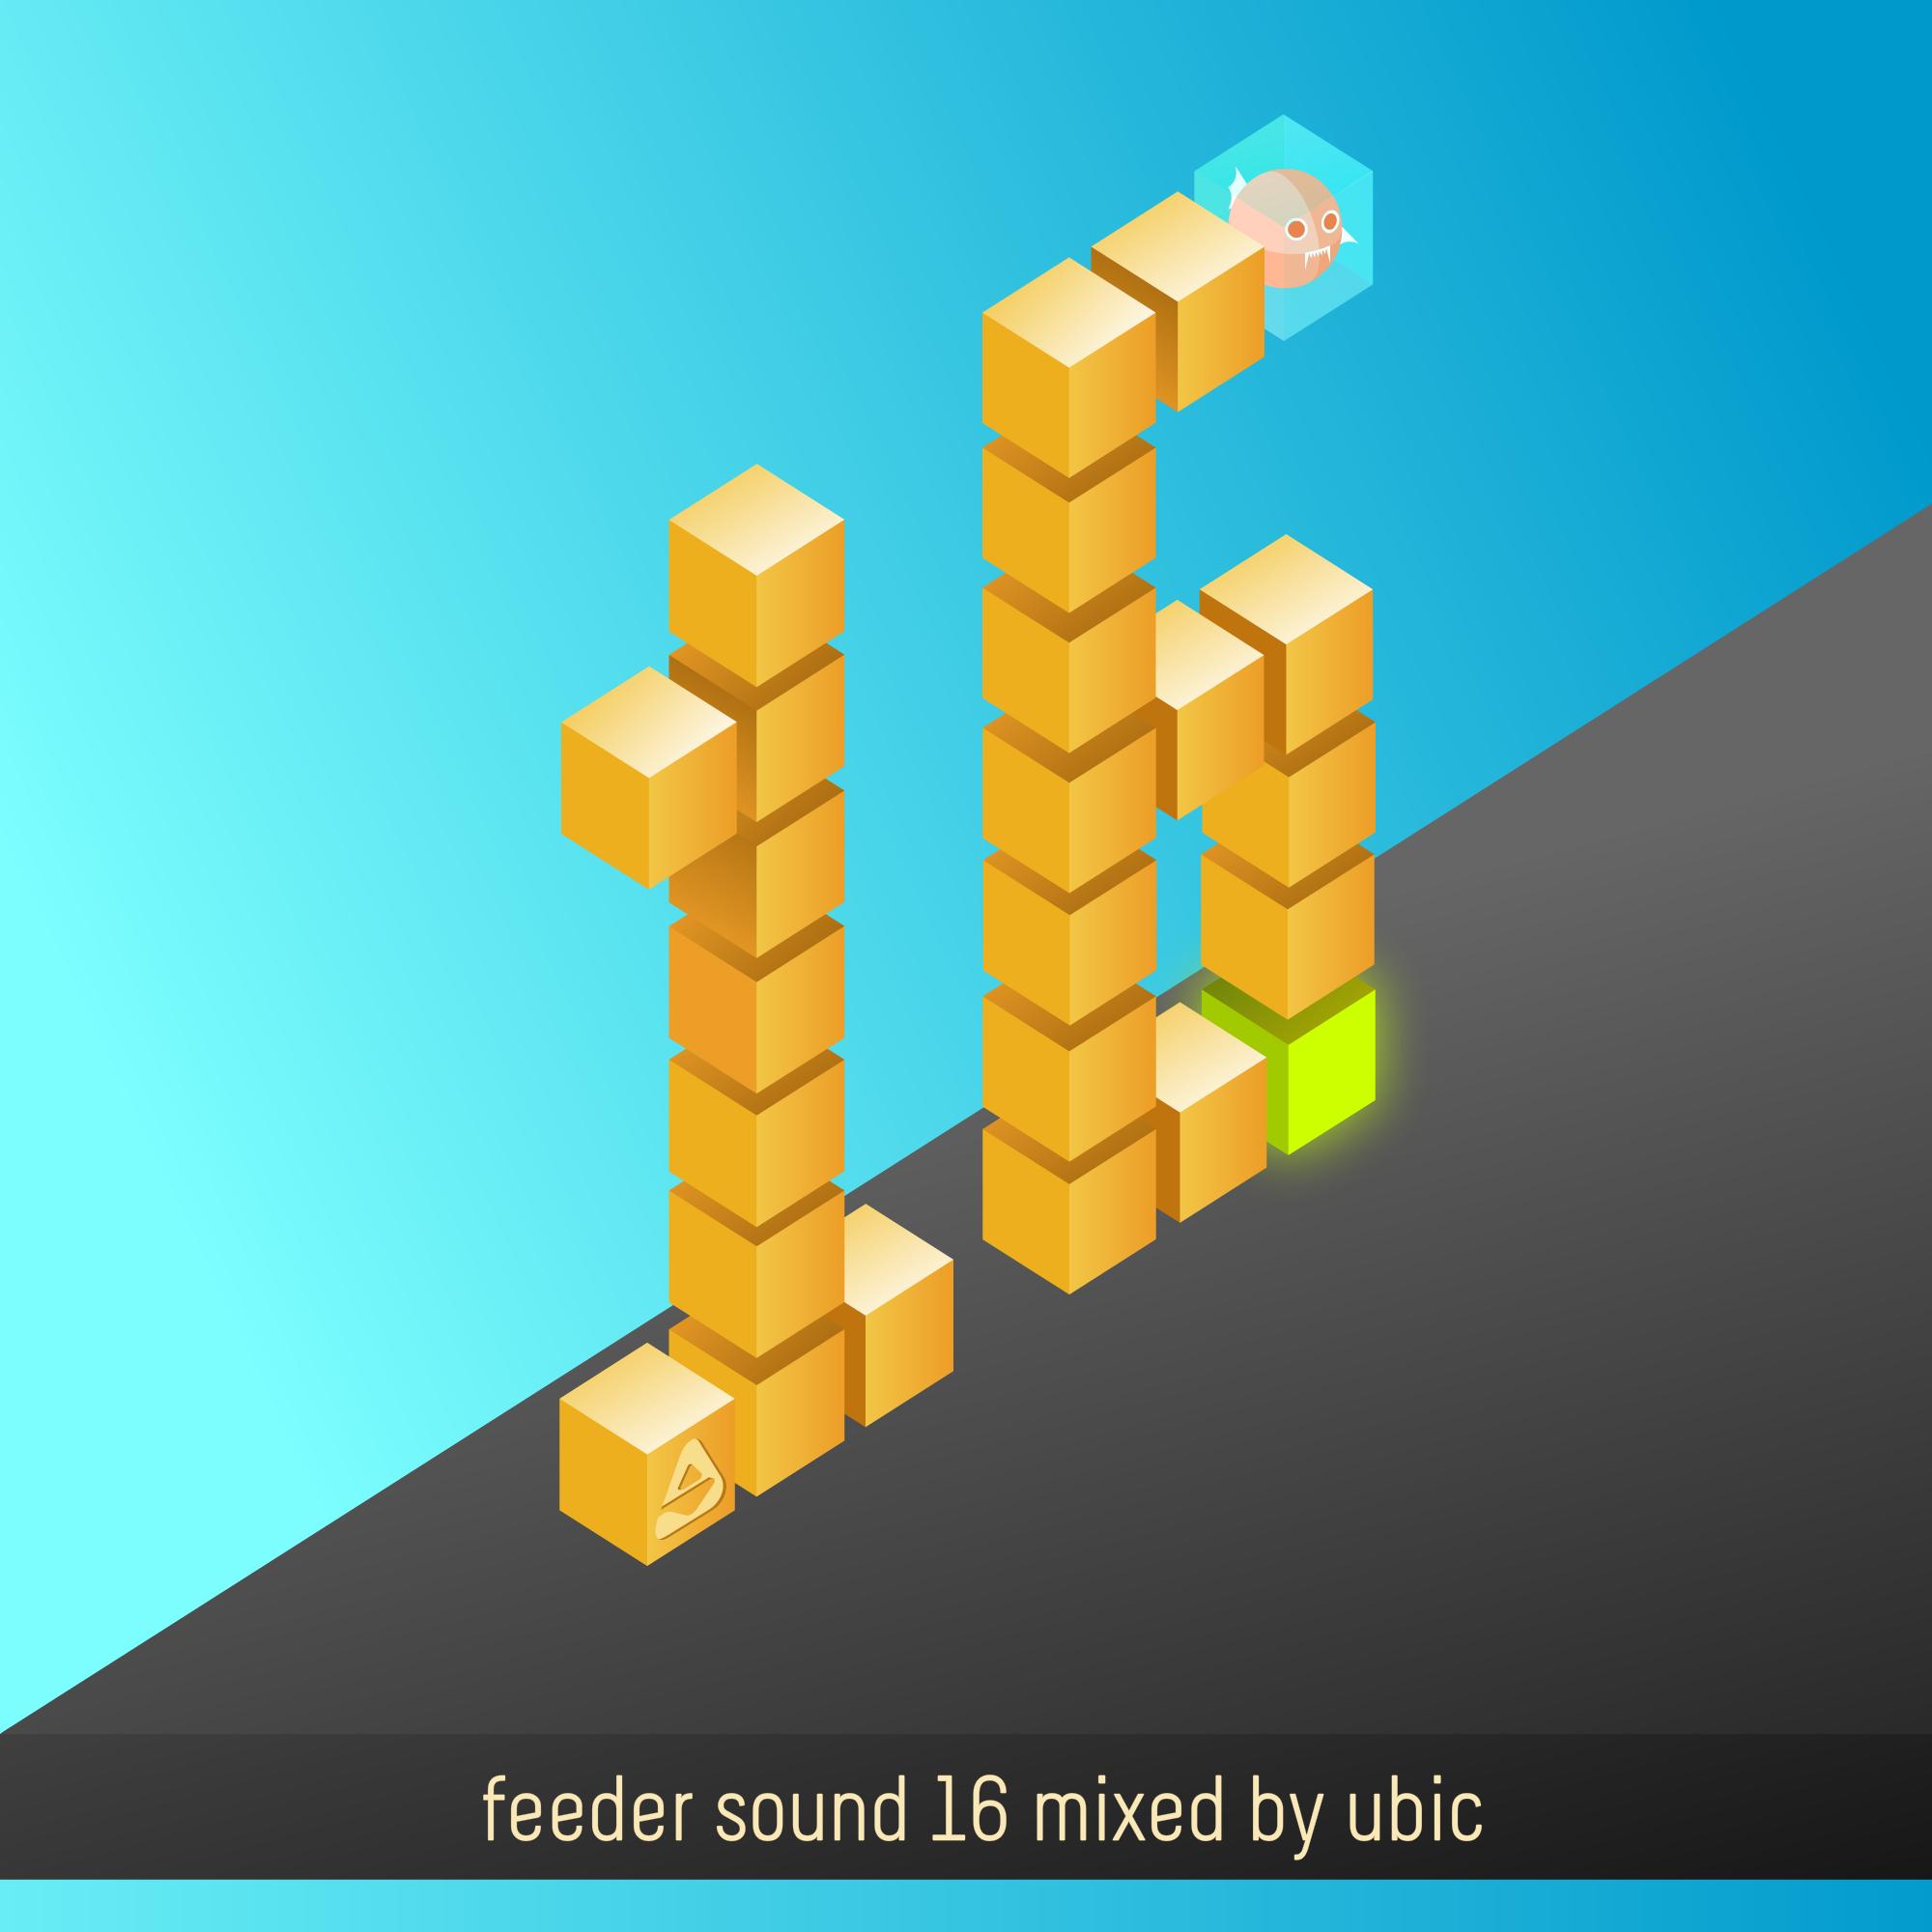 feeder sound 16 mixed by ubic